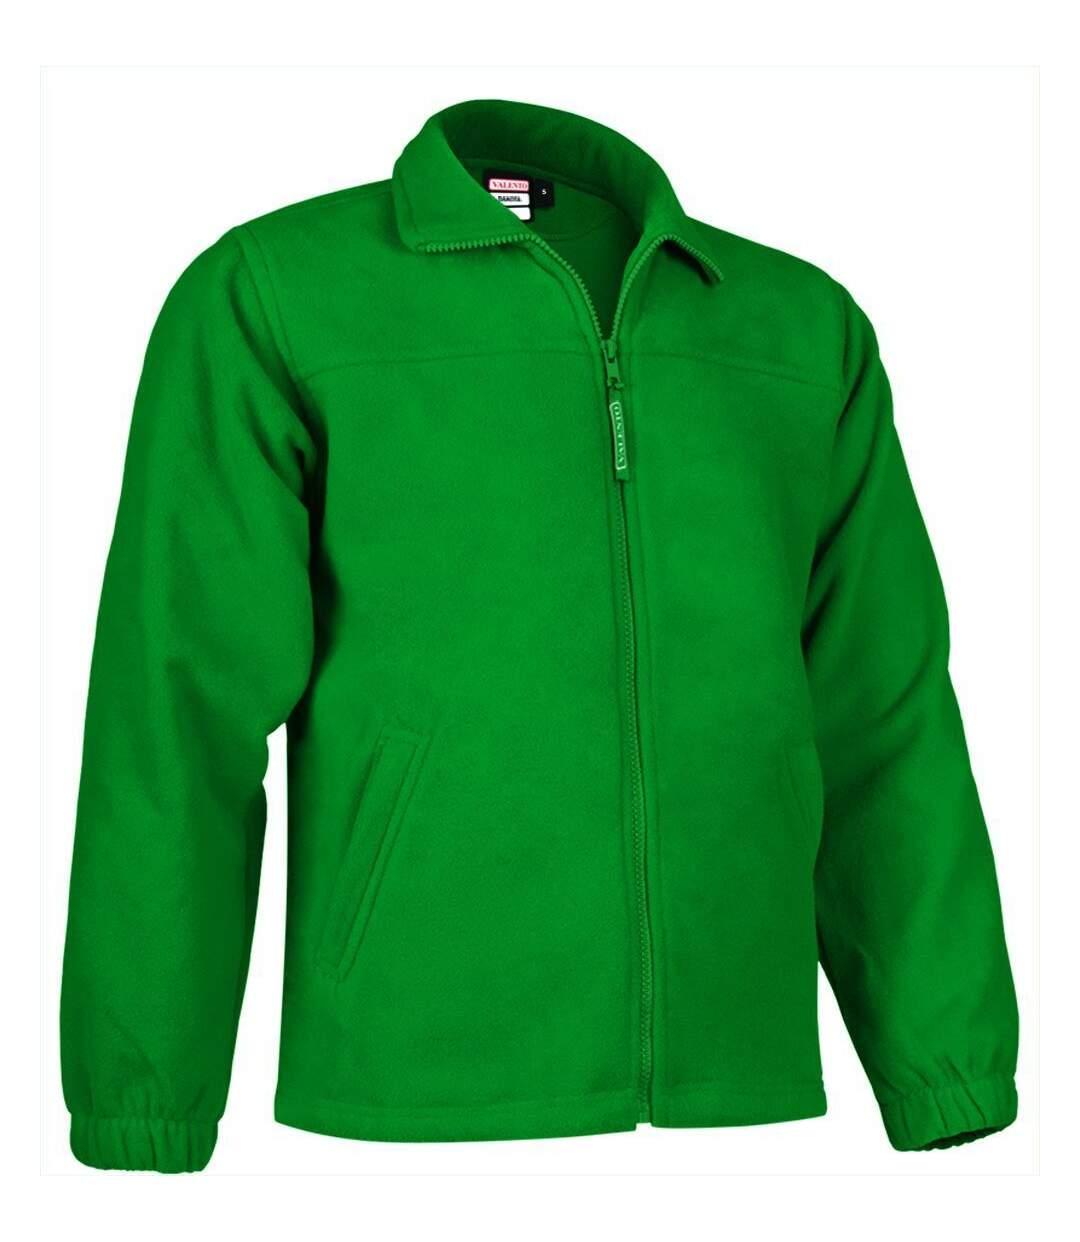 Veste polaire zippée - Homme - REF DAKOTA - vert kelly